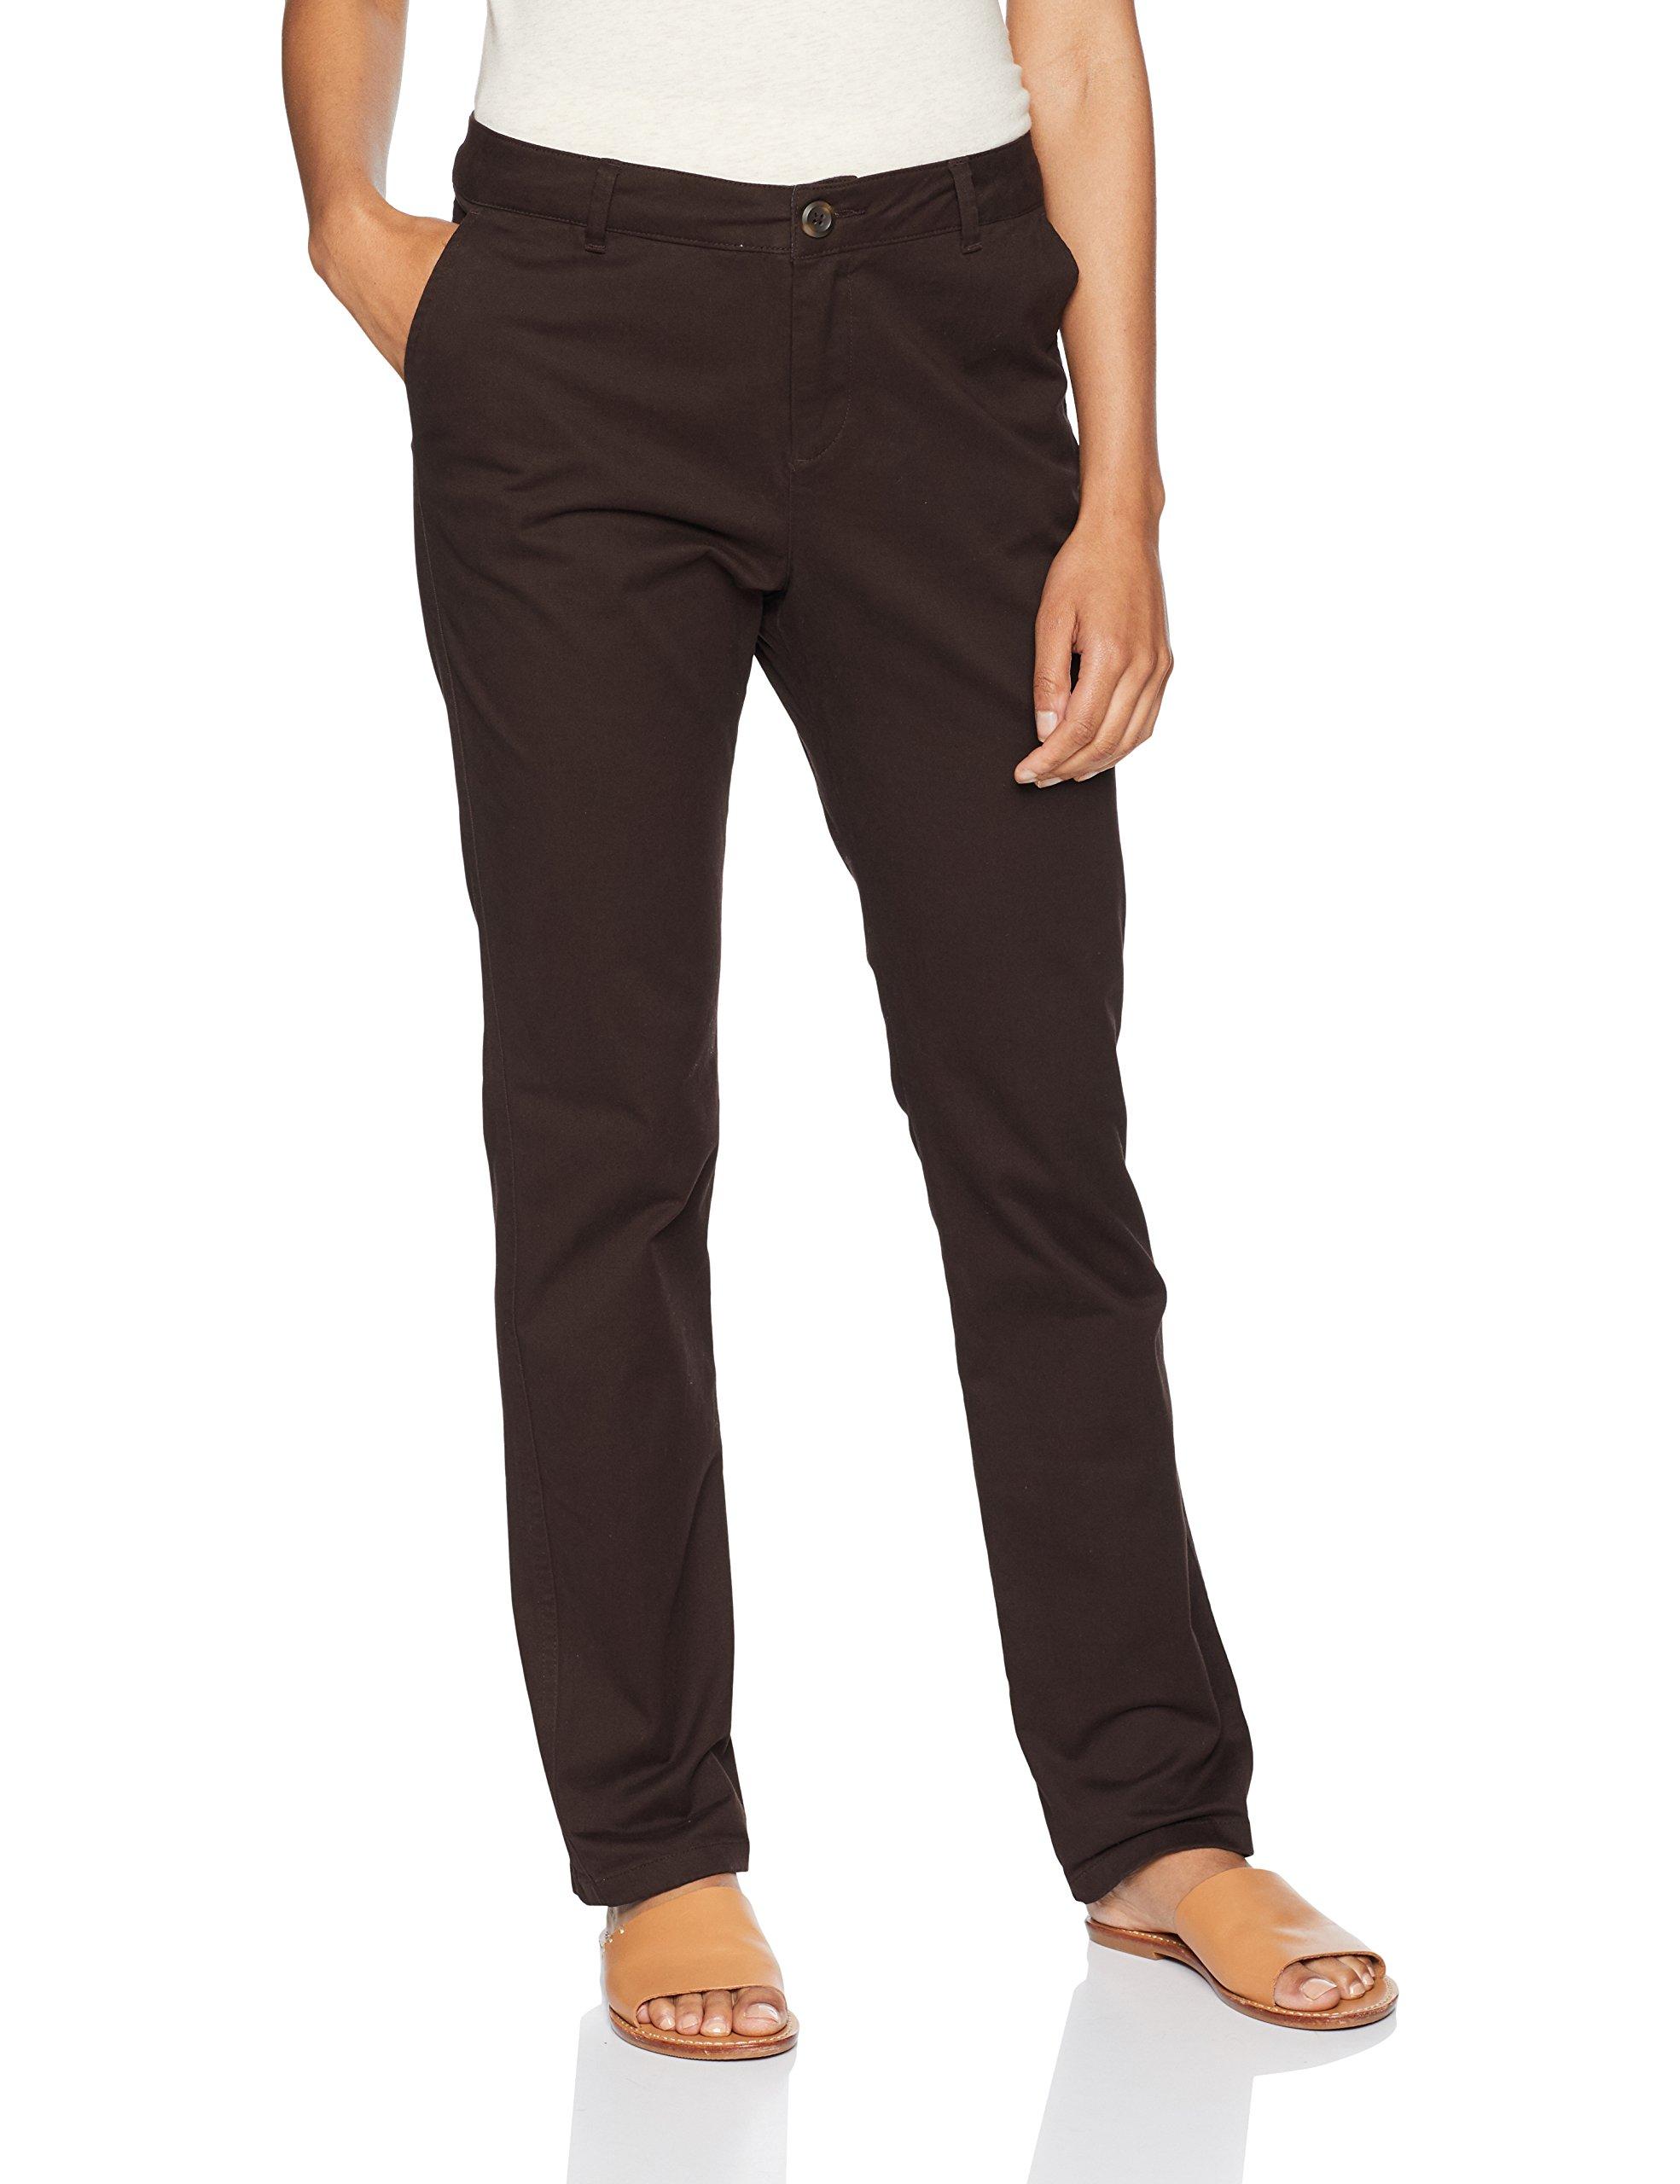 Amazon Essentials Women's Straight-Fit Stretch Twill Chino Pant, Brown, 18 Regular